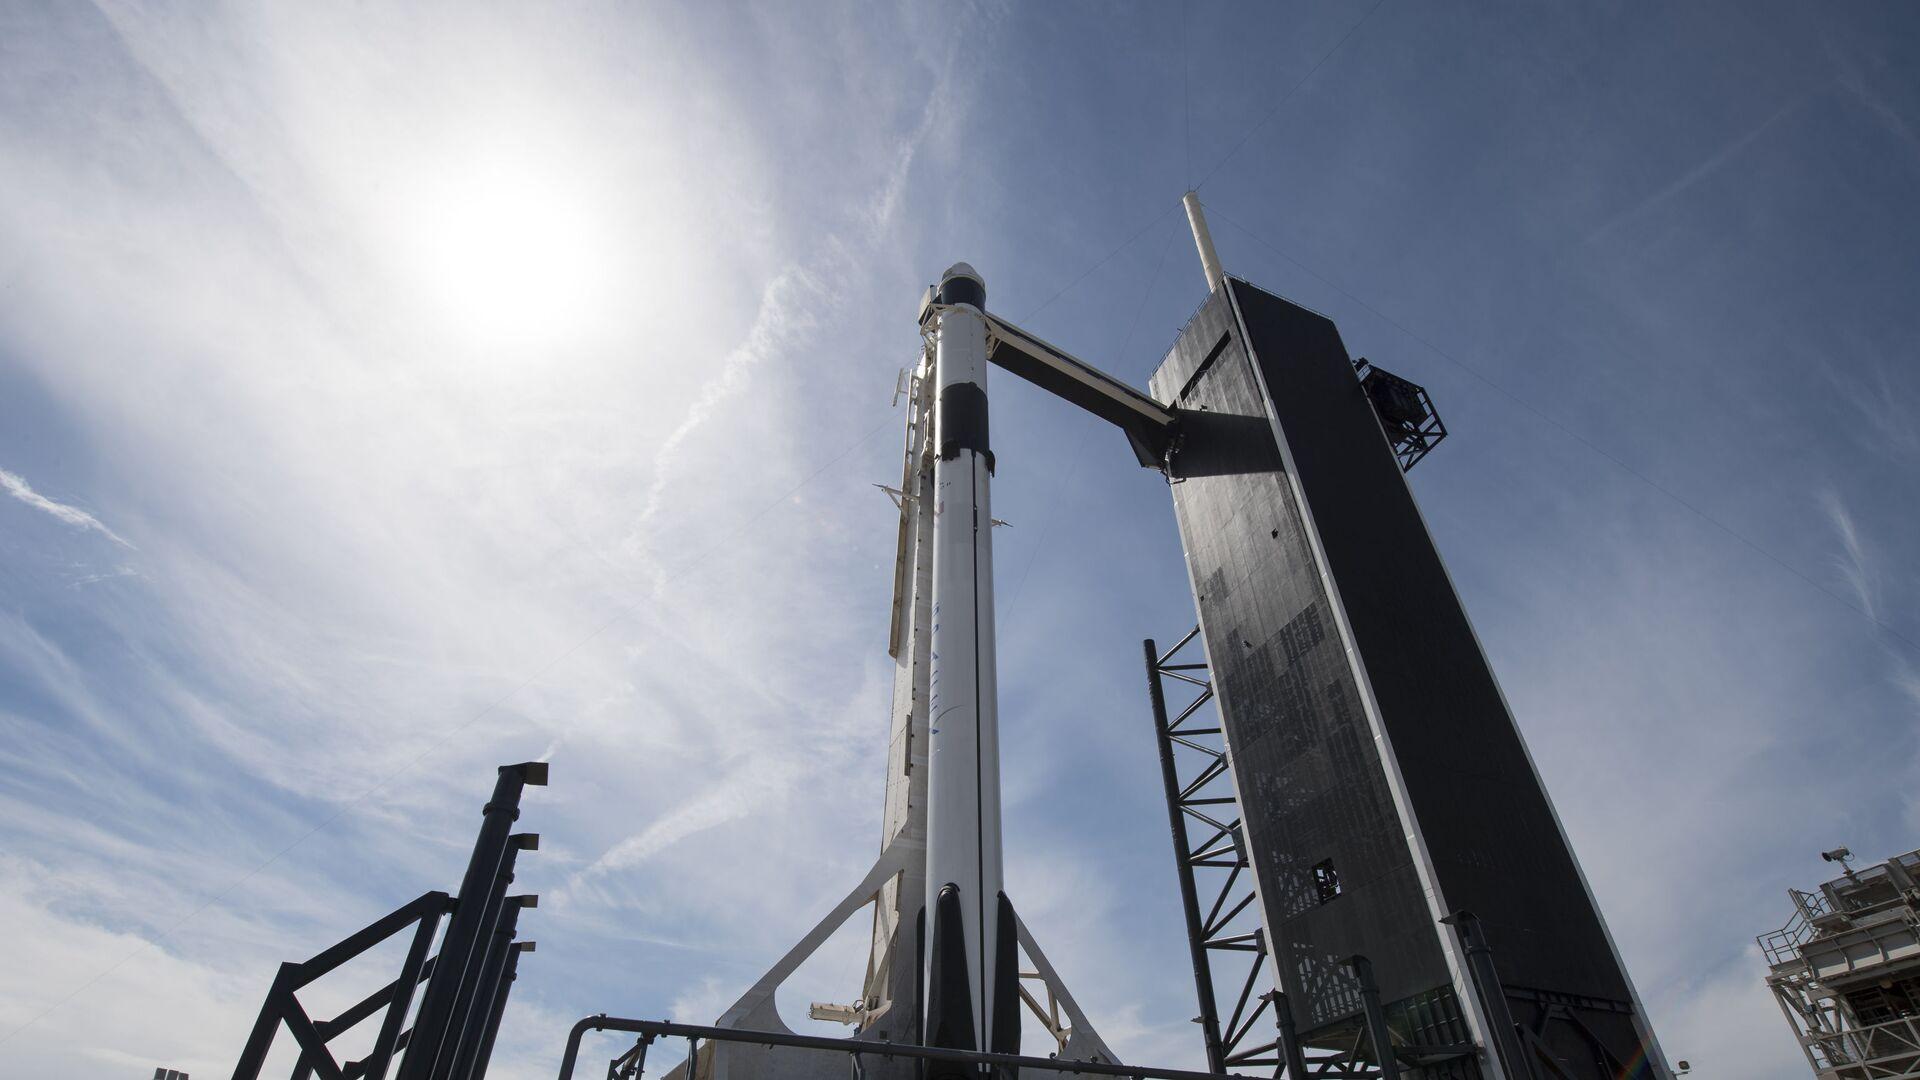 La nave espacial Crew Dragon de SpaceX - Sputnik Mundo, 1920, 24.03.2021